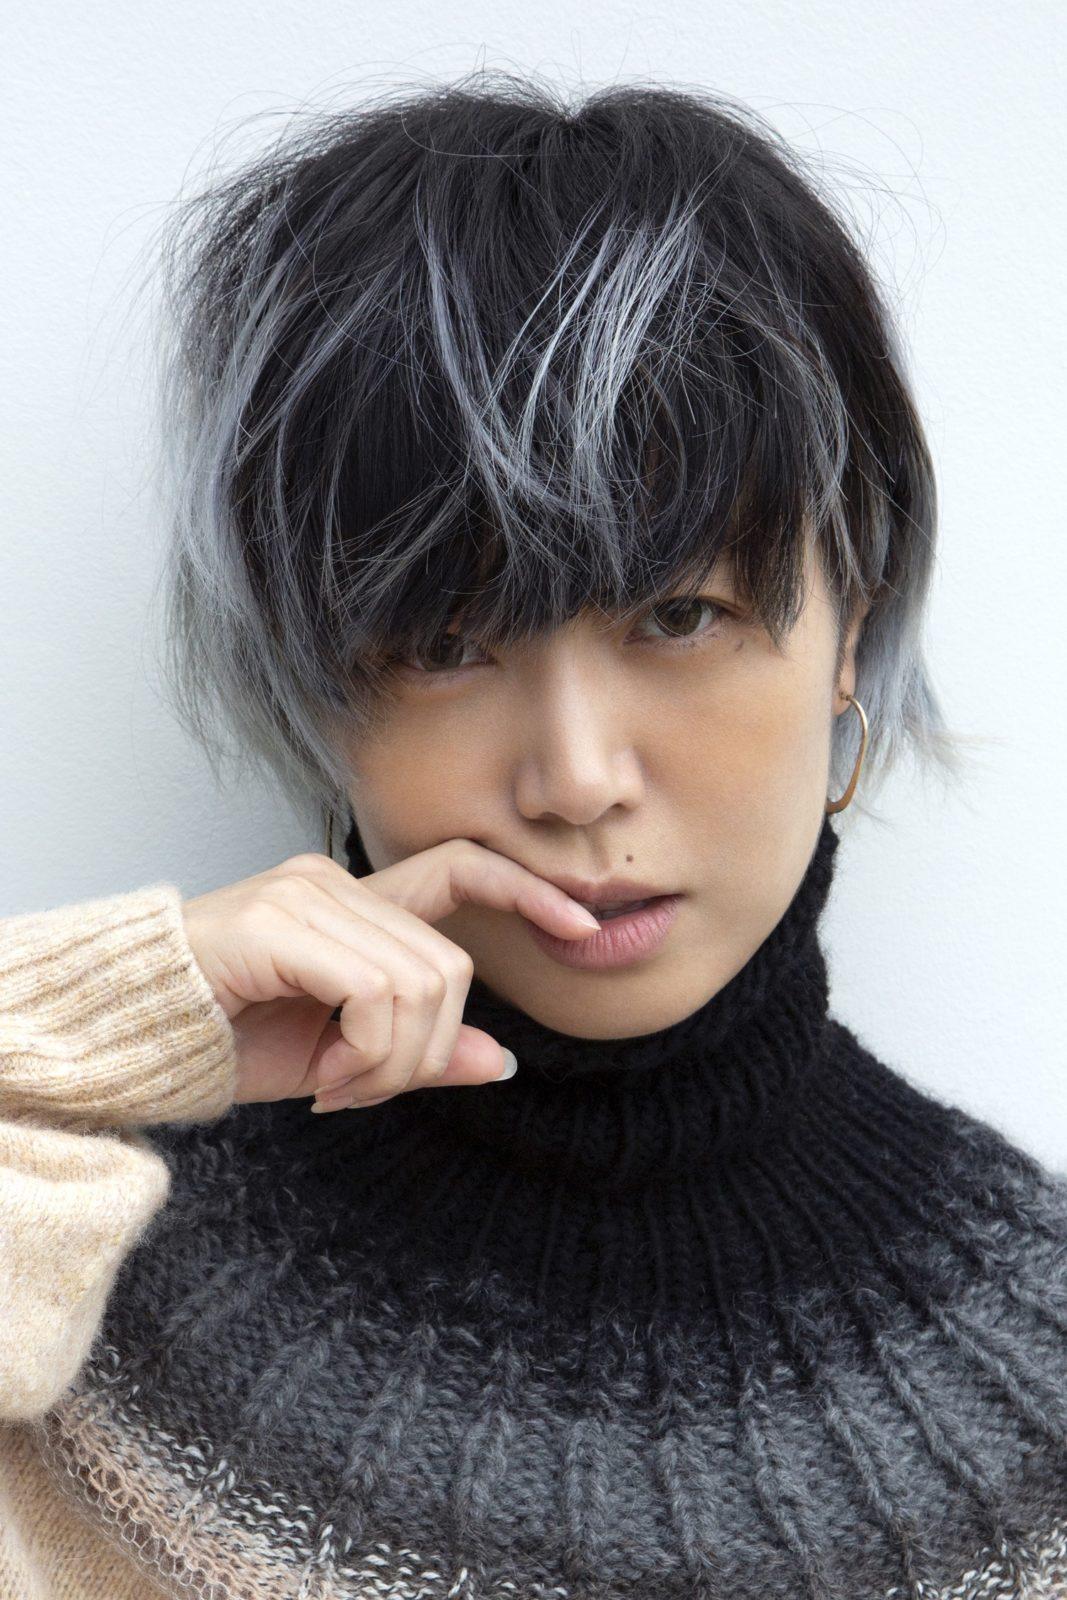 Salyuを迎えプラネタリウムライブツアー『LIVE in the DARK tour w/Salyu』福岡・東京の2都市で開催サムネイル画像!